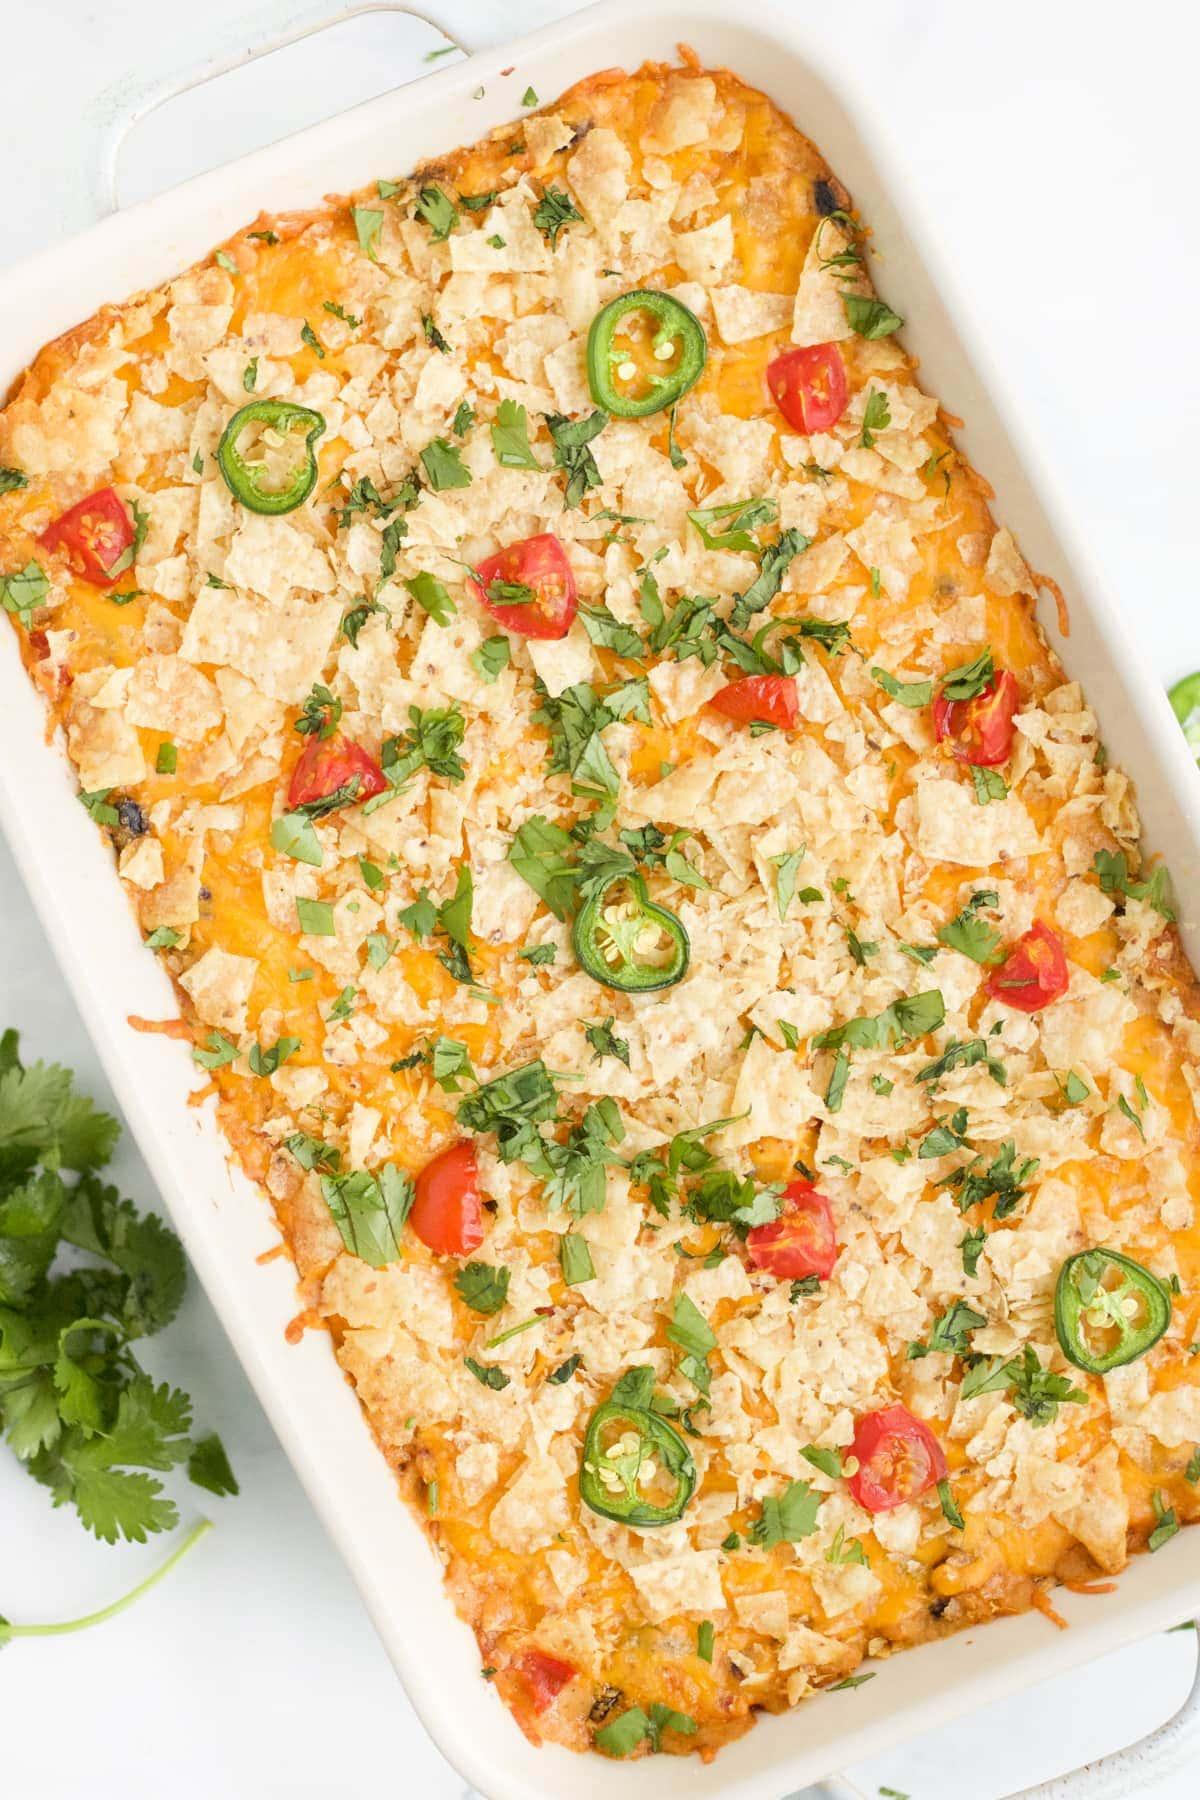 An overhead image of chicken taco casserole